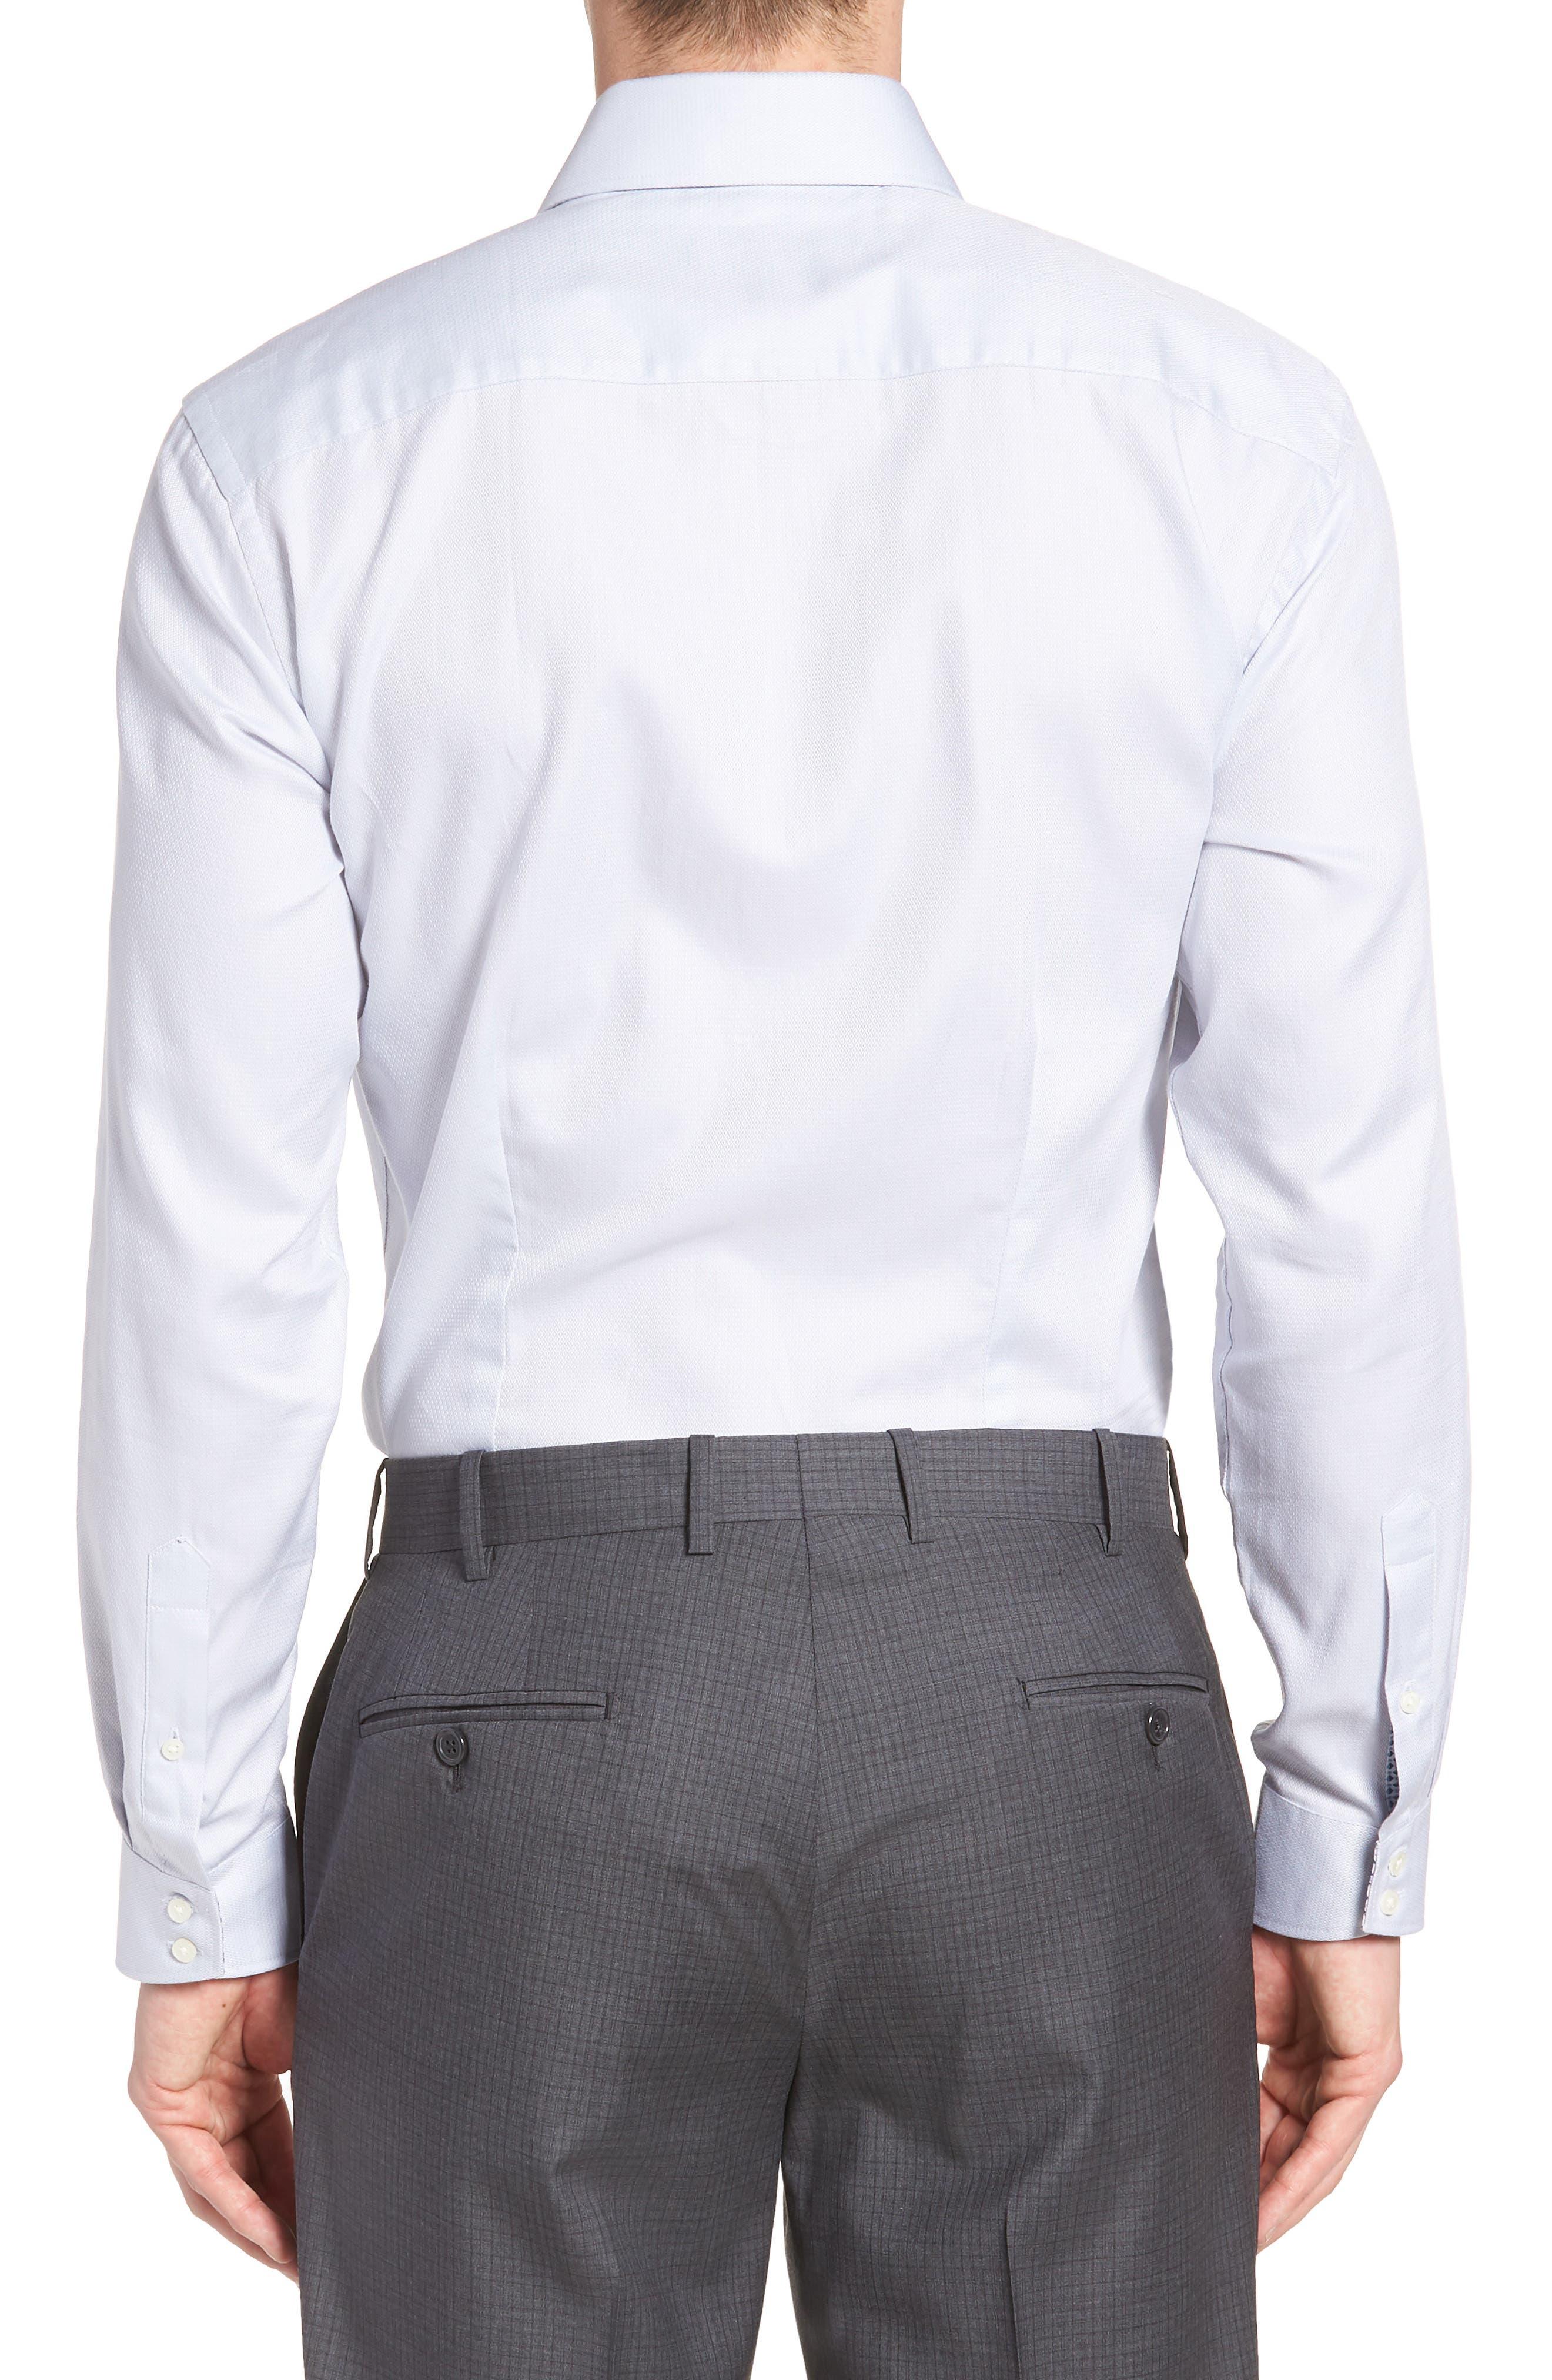 Ollyox Slim Fit Solid Dress Shirt,                             Alternate thumbnail 3, color,                             GREY